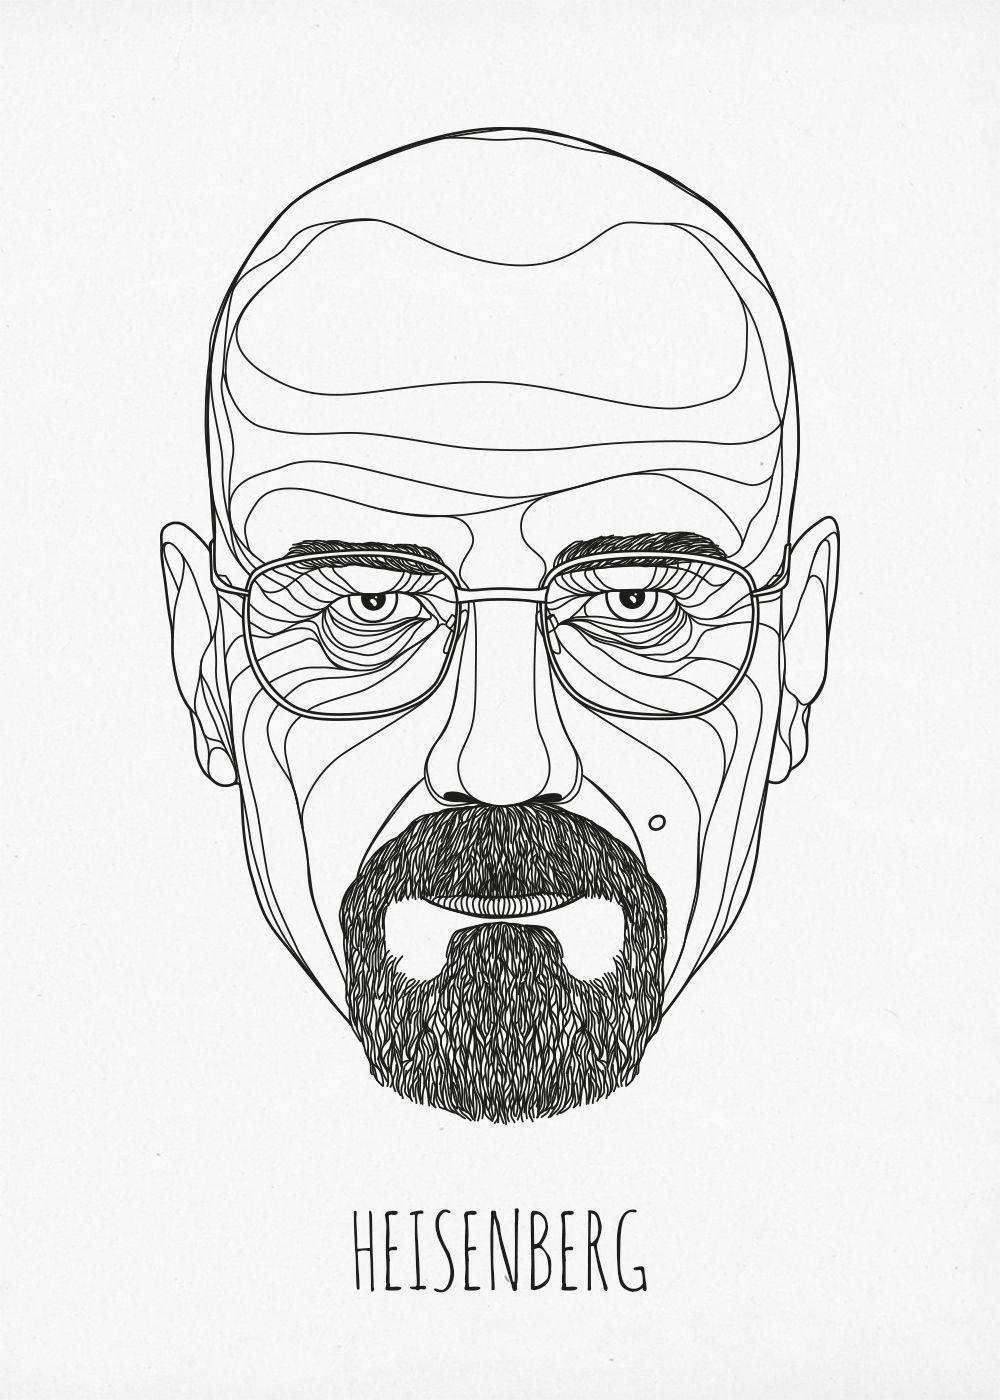 Heisenberg by topf (via Creattica) illustration Colagem